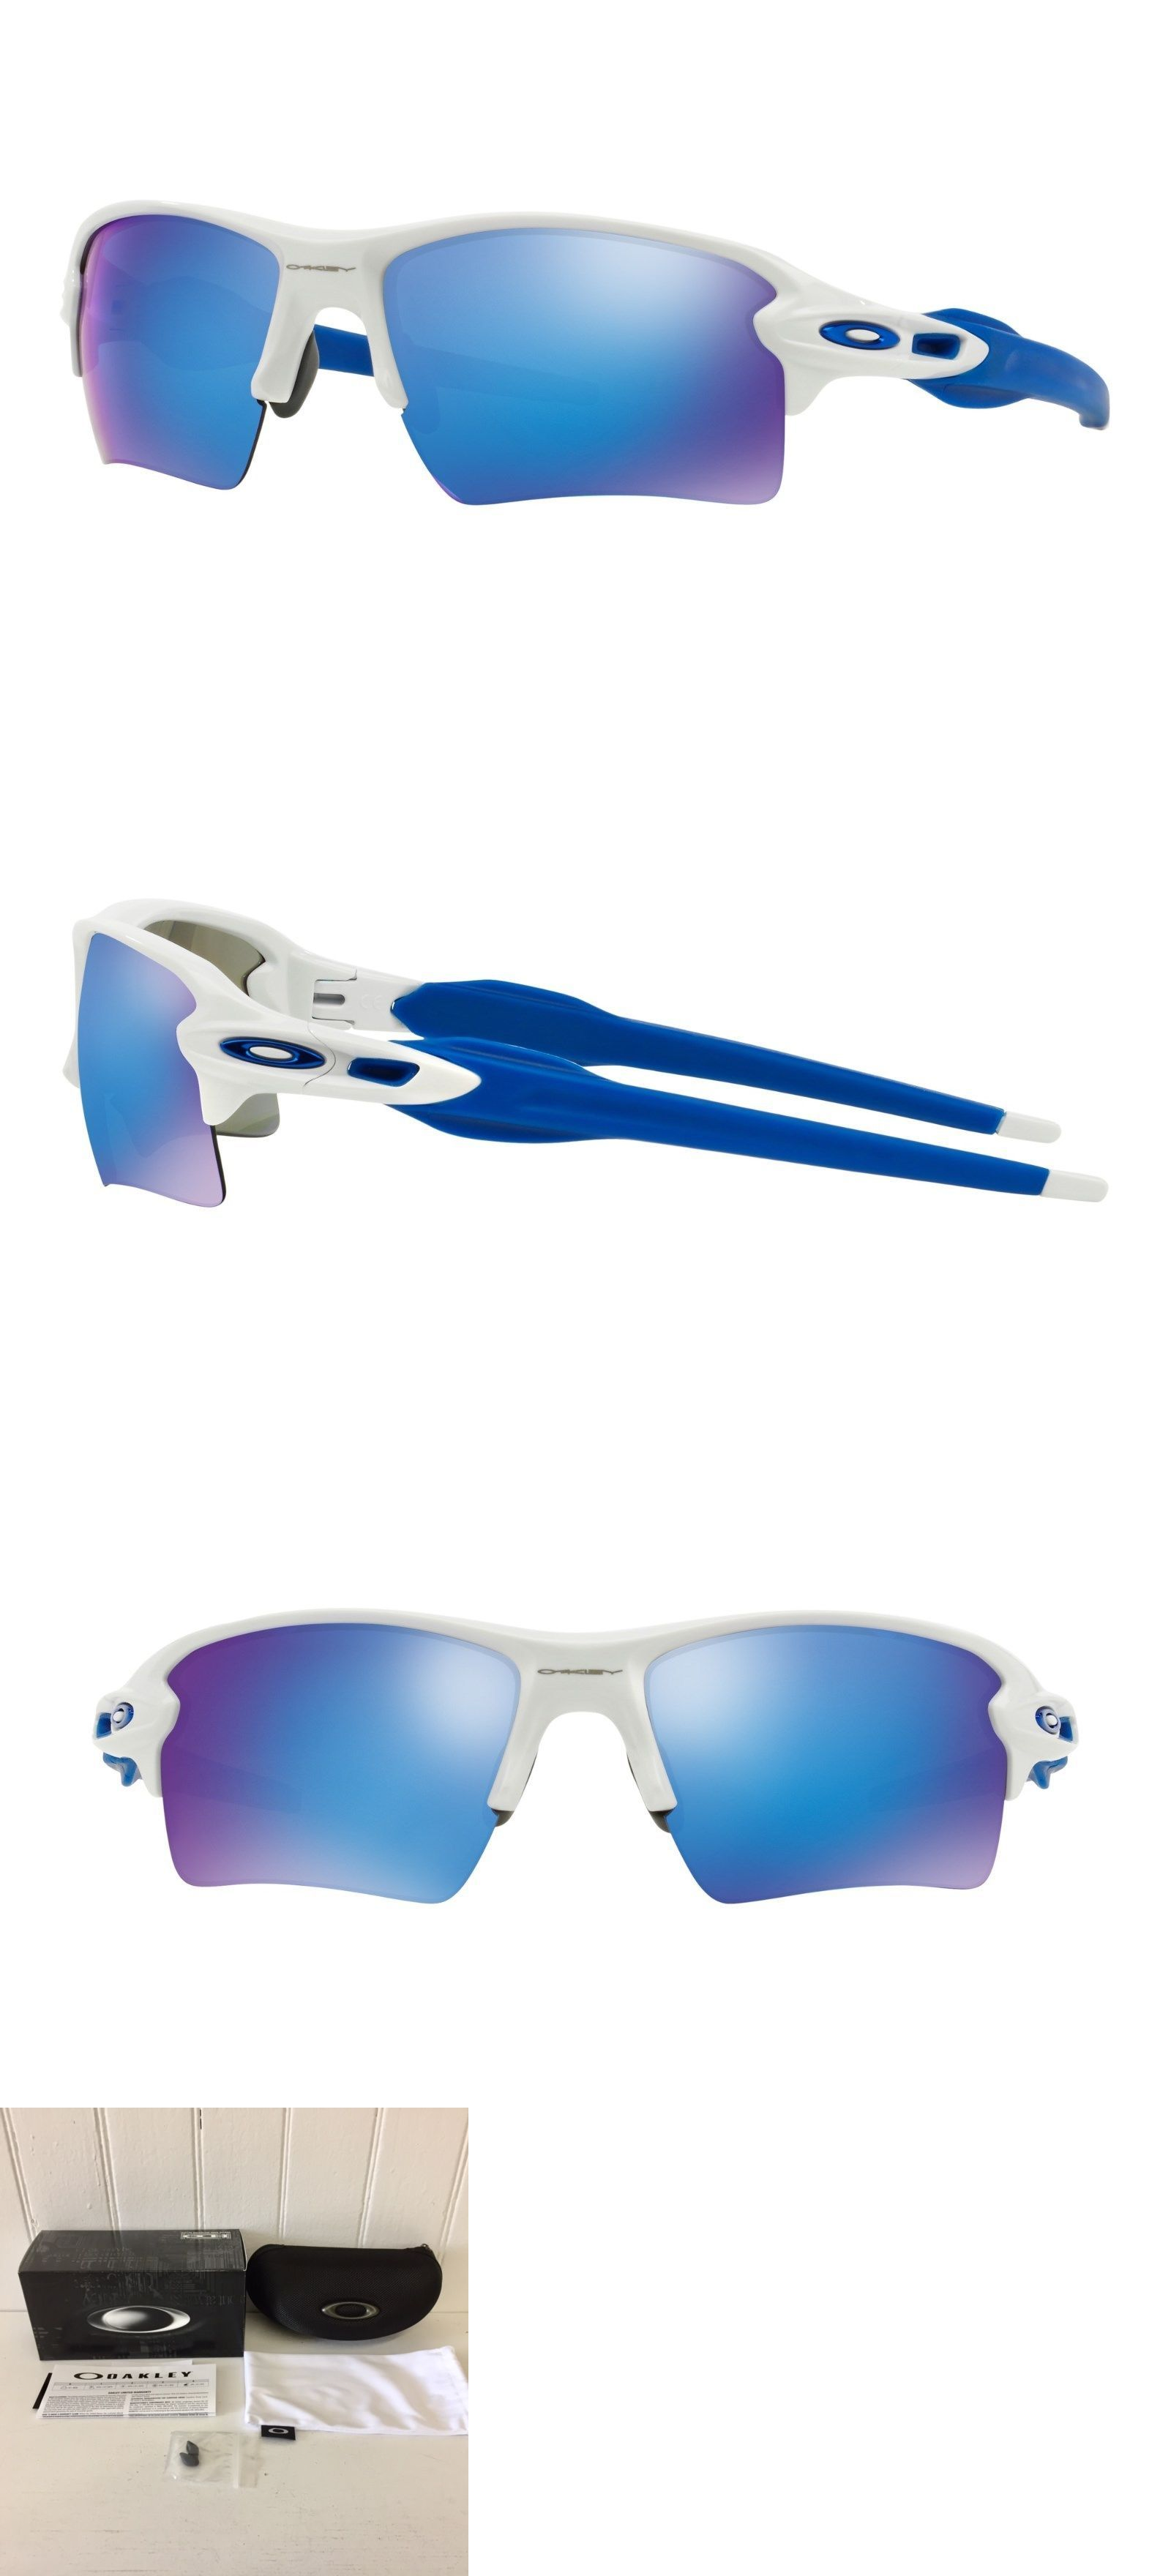 66c576a2384 Sunglasses and Goggles 56185  Oakley Oo9188-20 Flak 2.0 Xl Polished White W  Sapphire